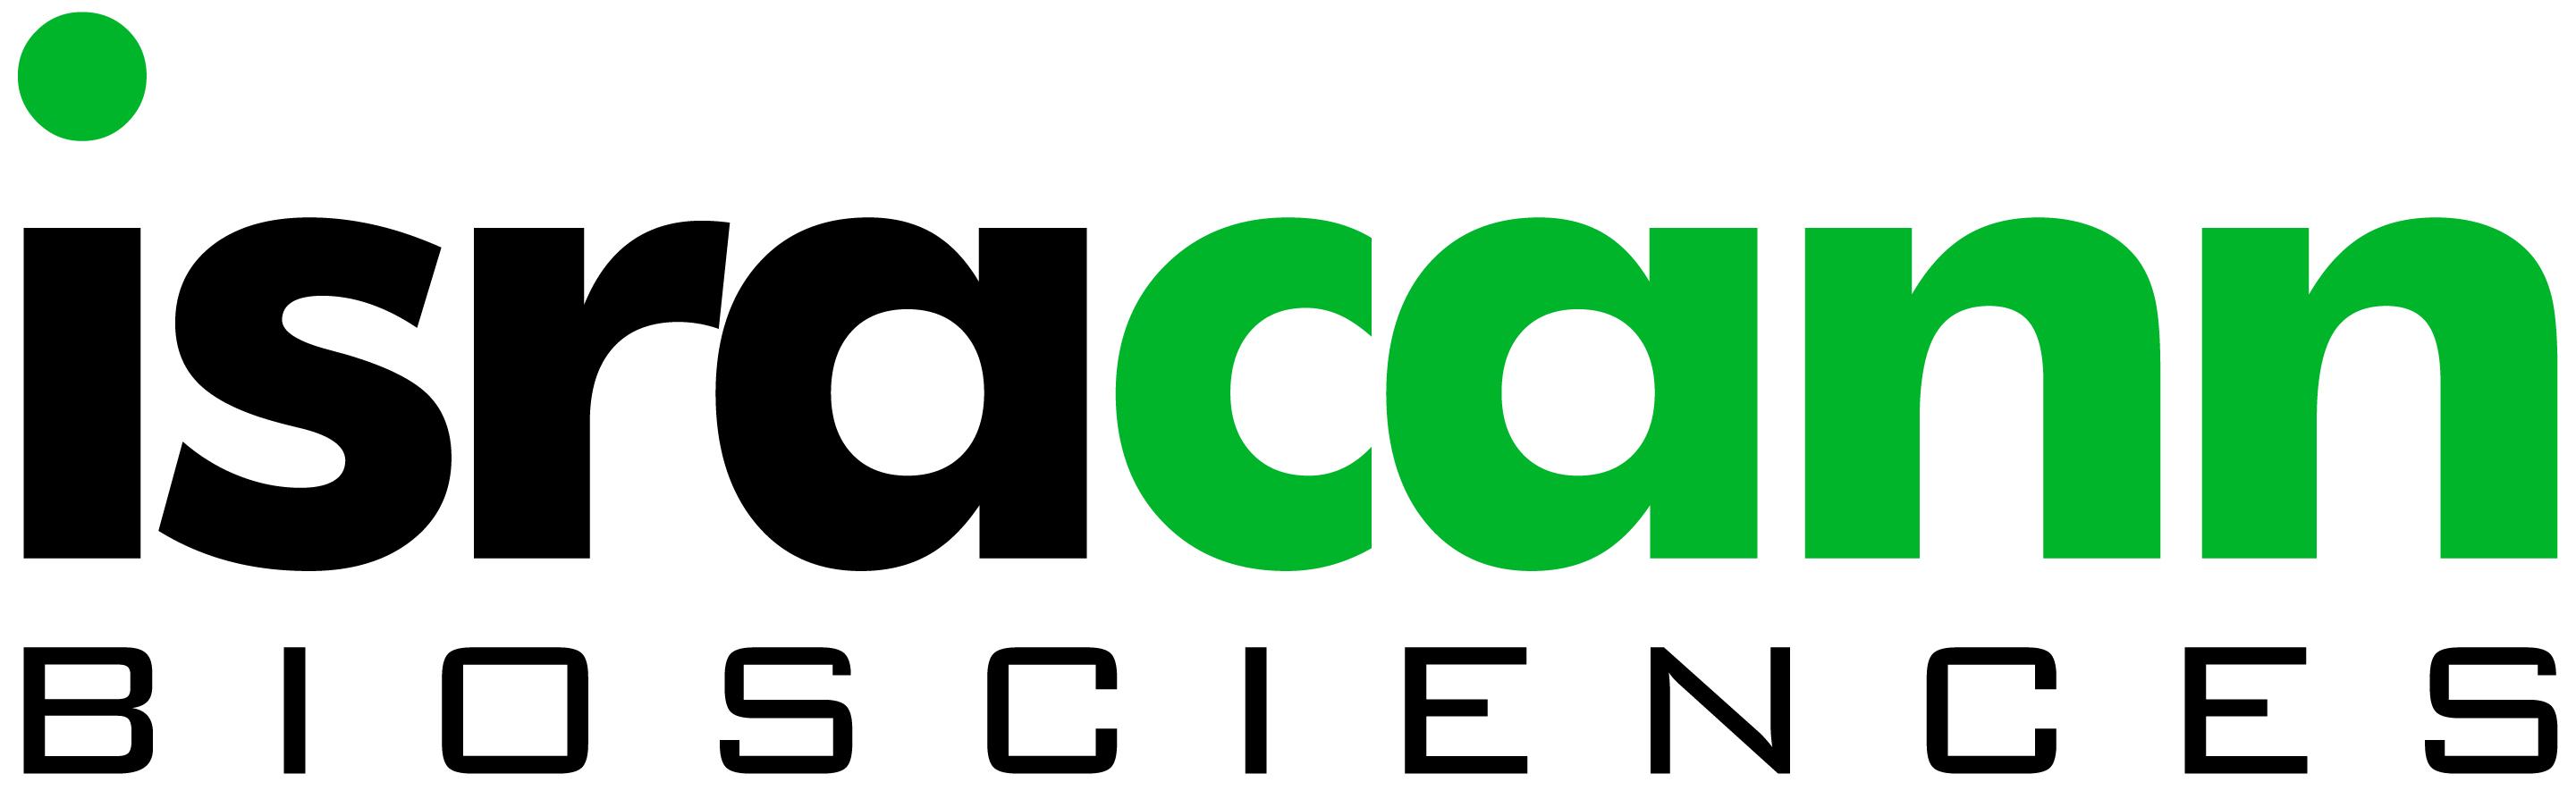 "Isracann Biosciences Announces OTC Trading Symbol Change to ""ISCNF"", Effective November 15, 2019"